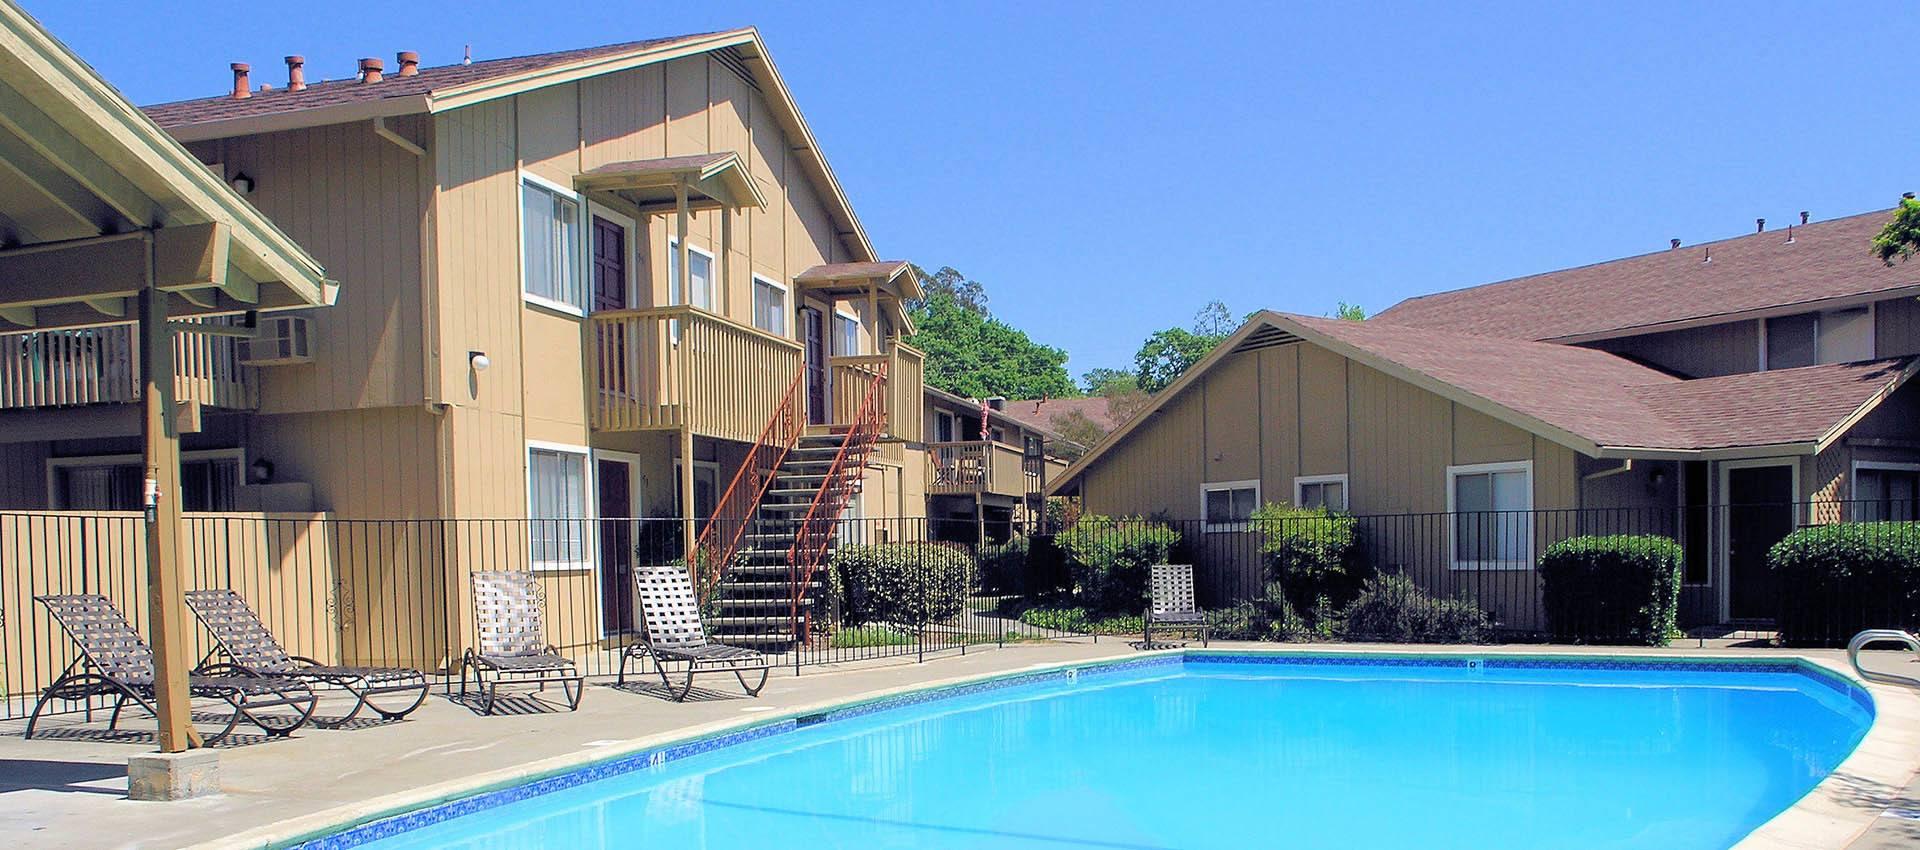 Pool deck at Spring Lake Apartment Homes